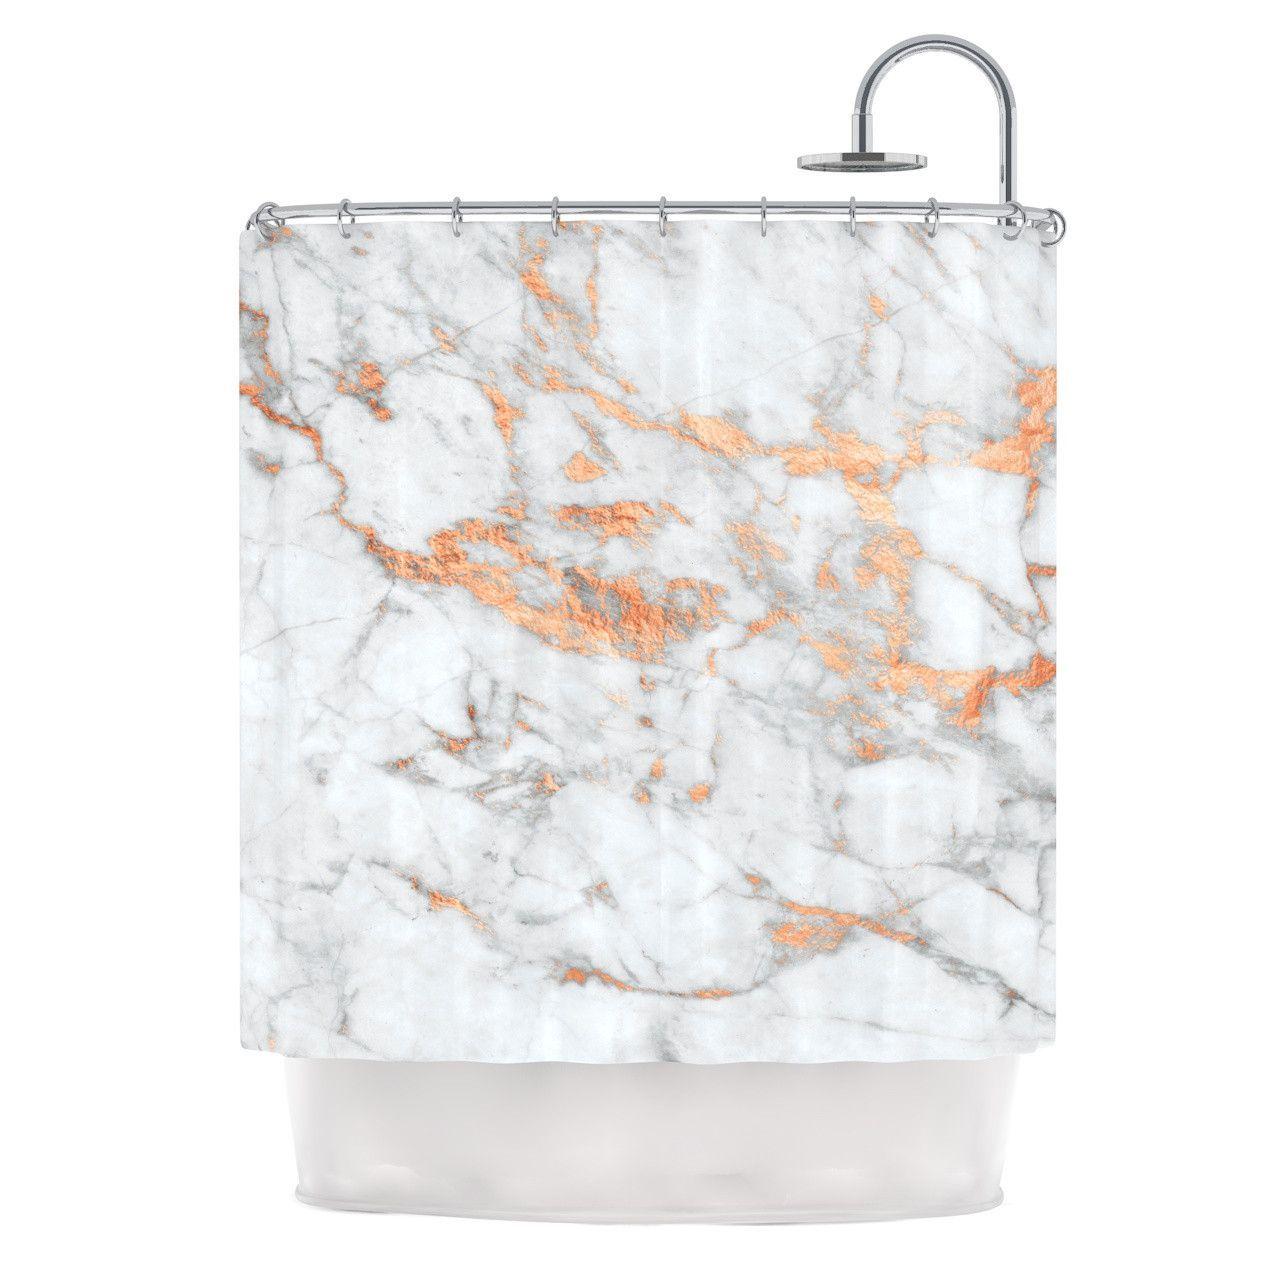 Oceanside Pink Shower Curtains Gold Bathroom Accessories Gold Bathroom